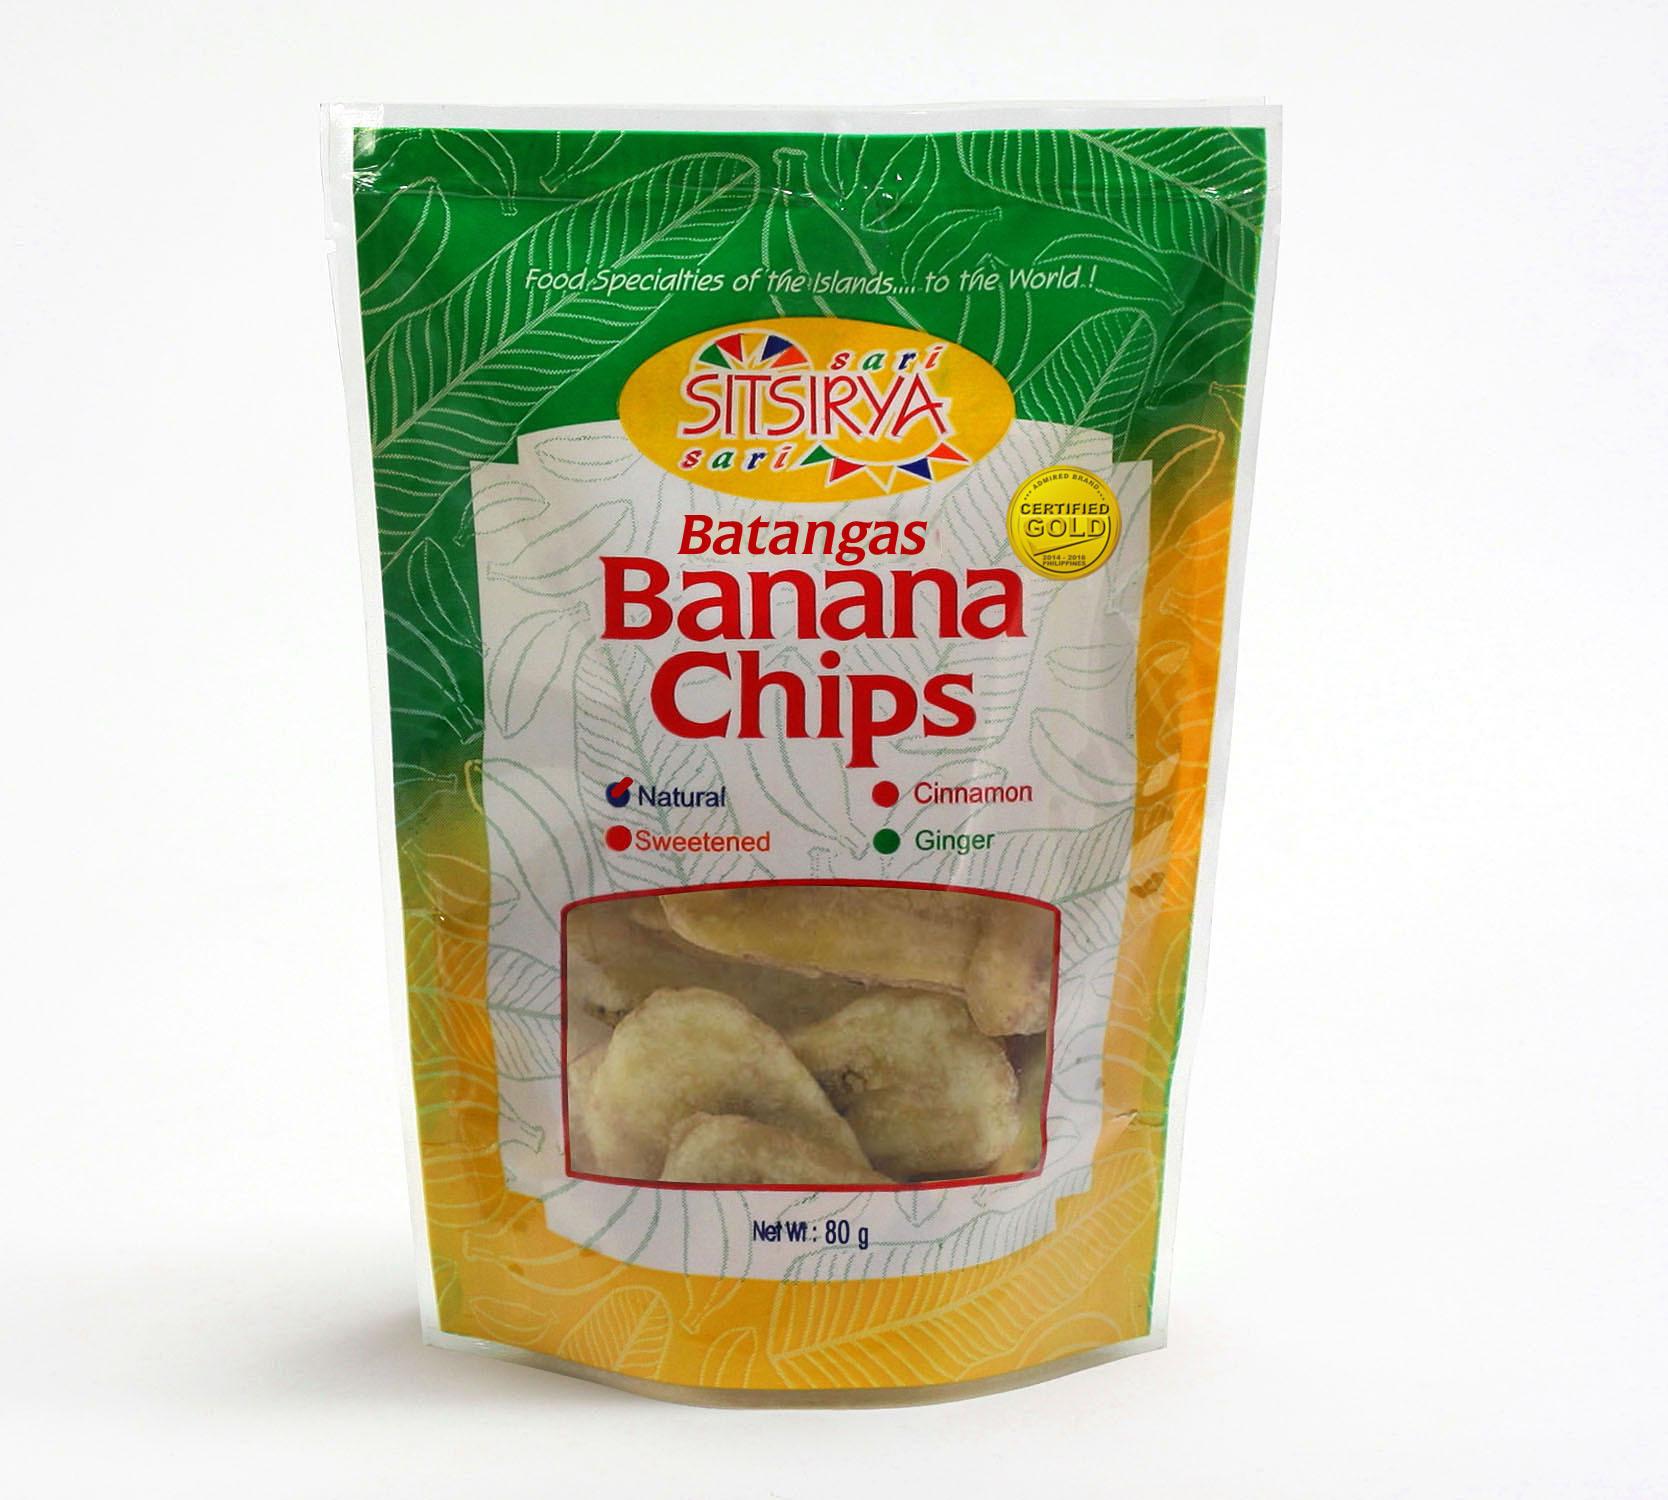 Sitsirya Batangas Banana Chips Natural pouch (4806526700938) - (In Packs of 3)